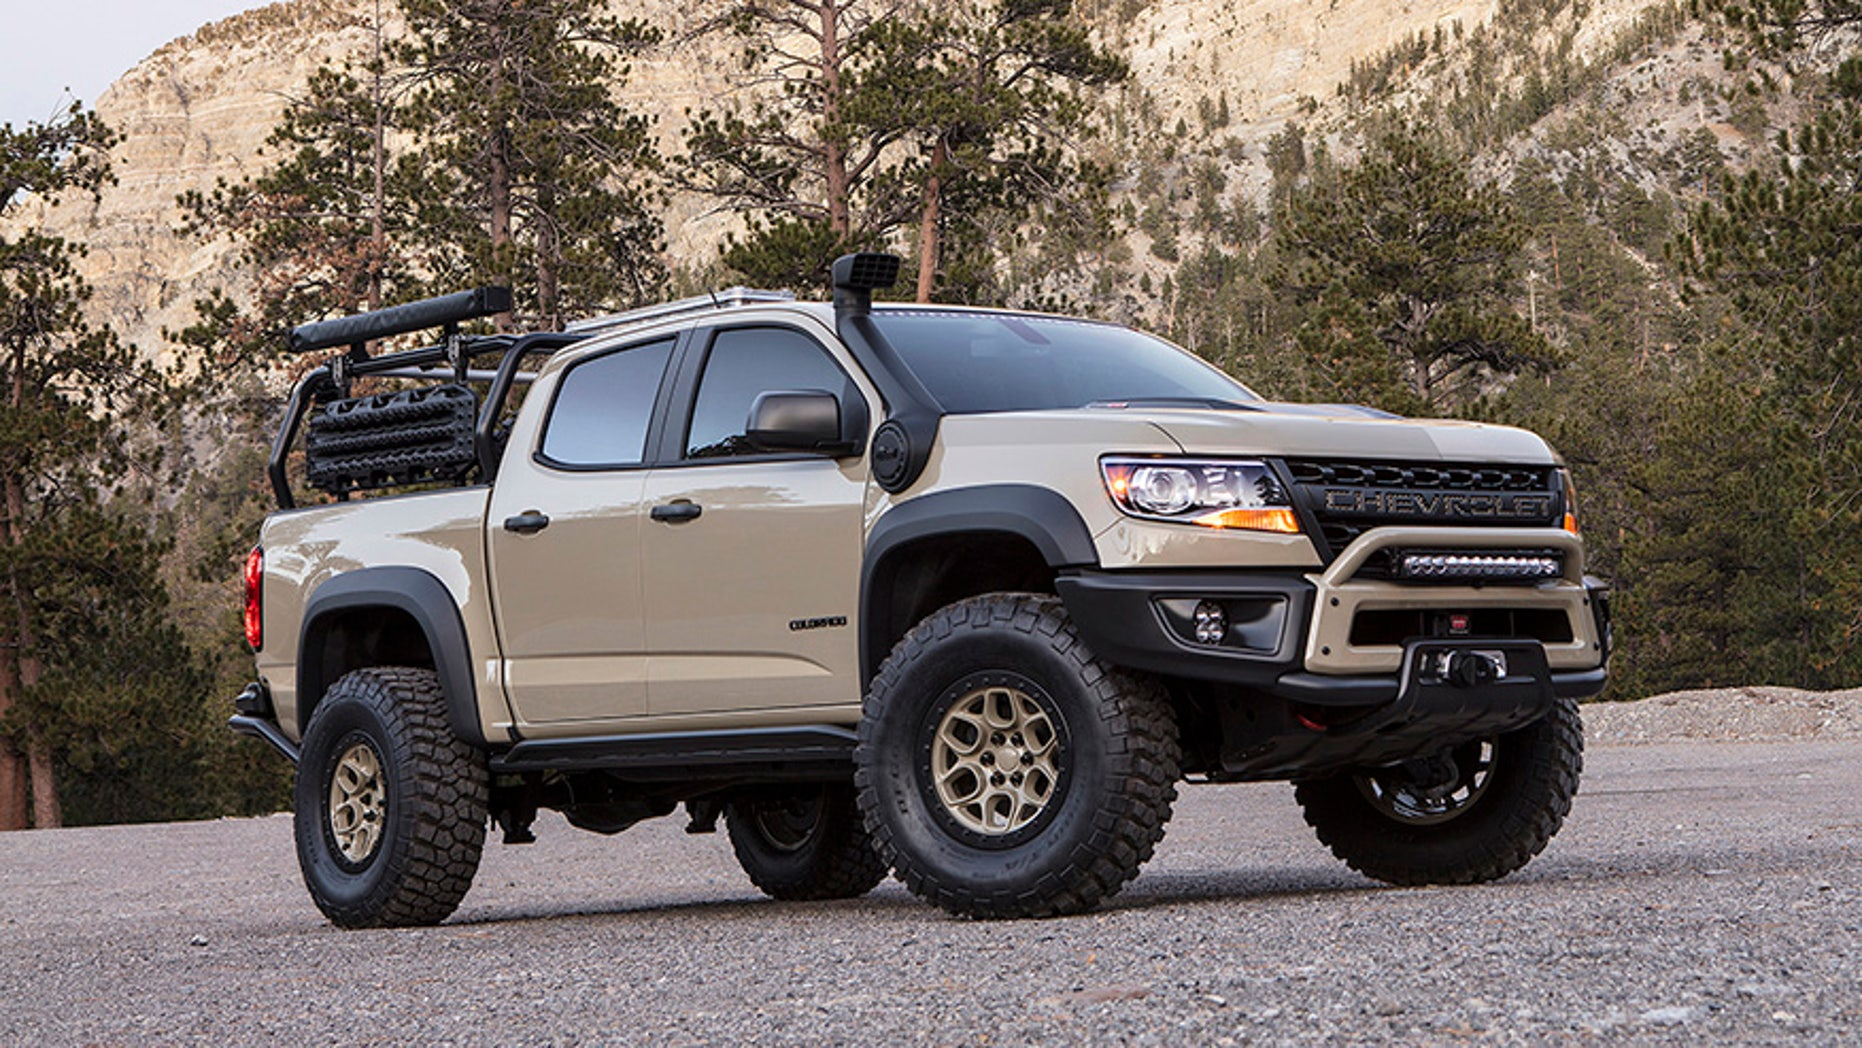 The Chevrolet Colorado Zr2 Aev Is Ready For Adventure Fox News